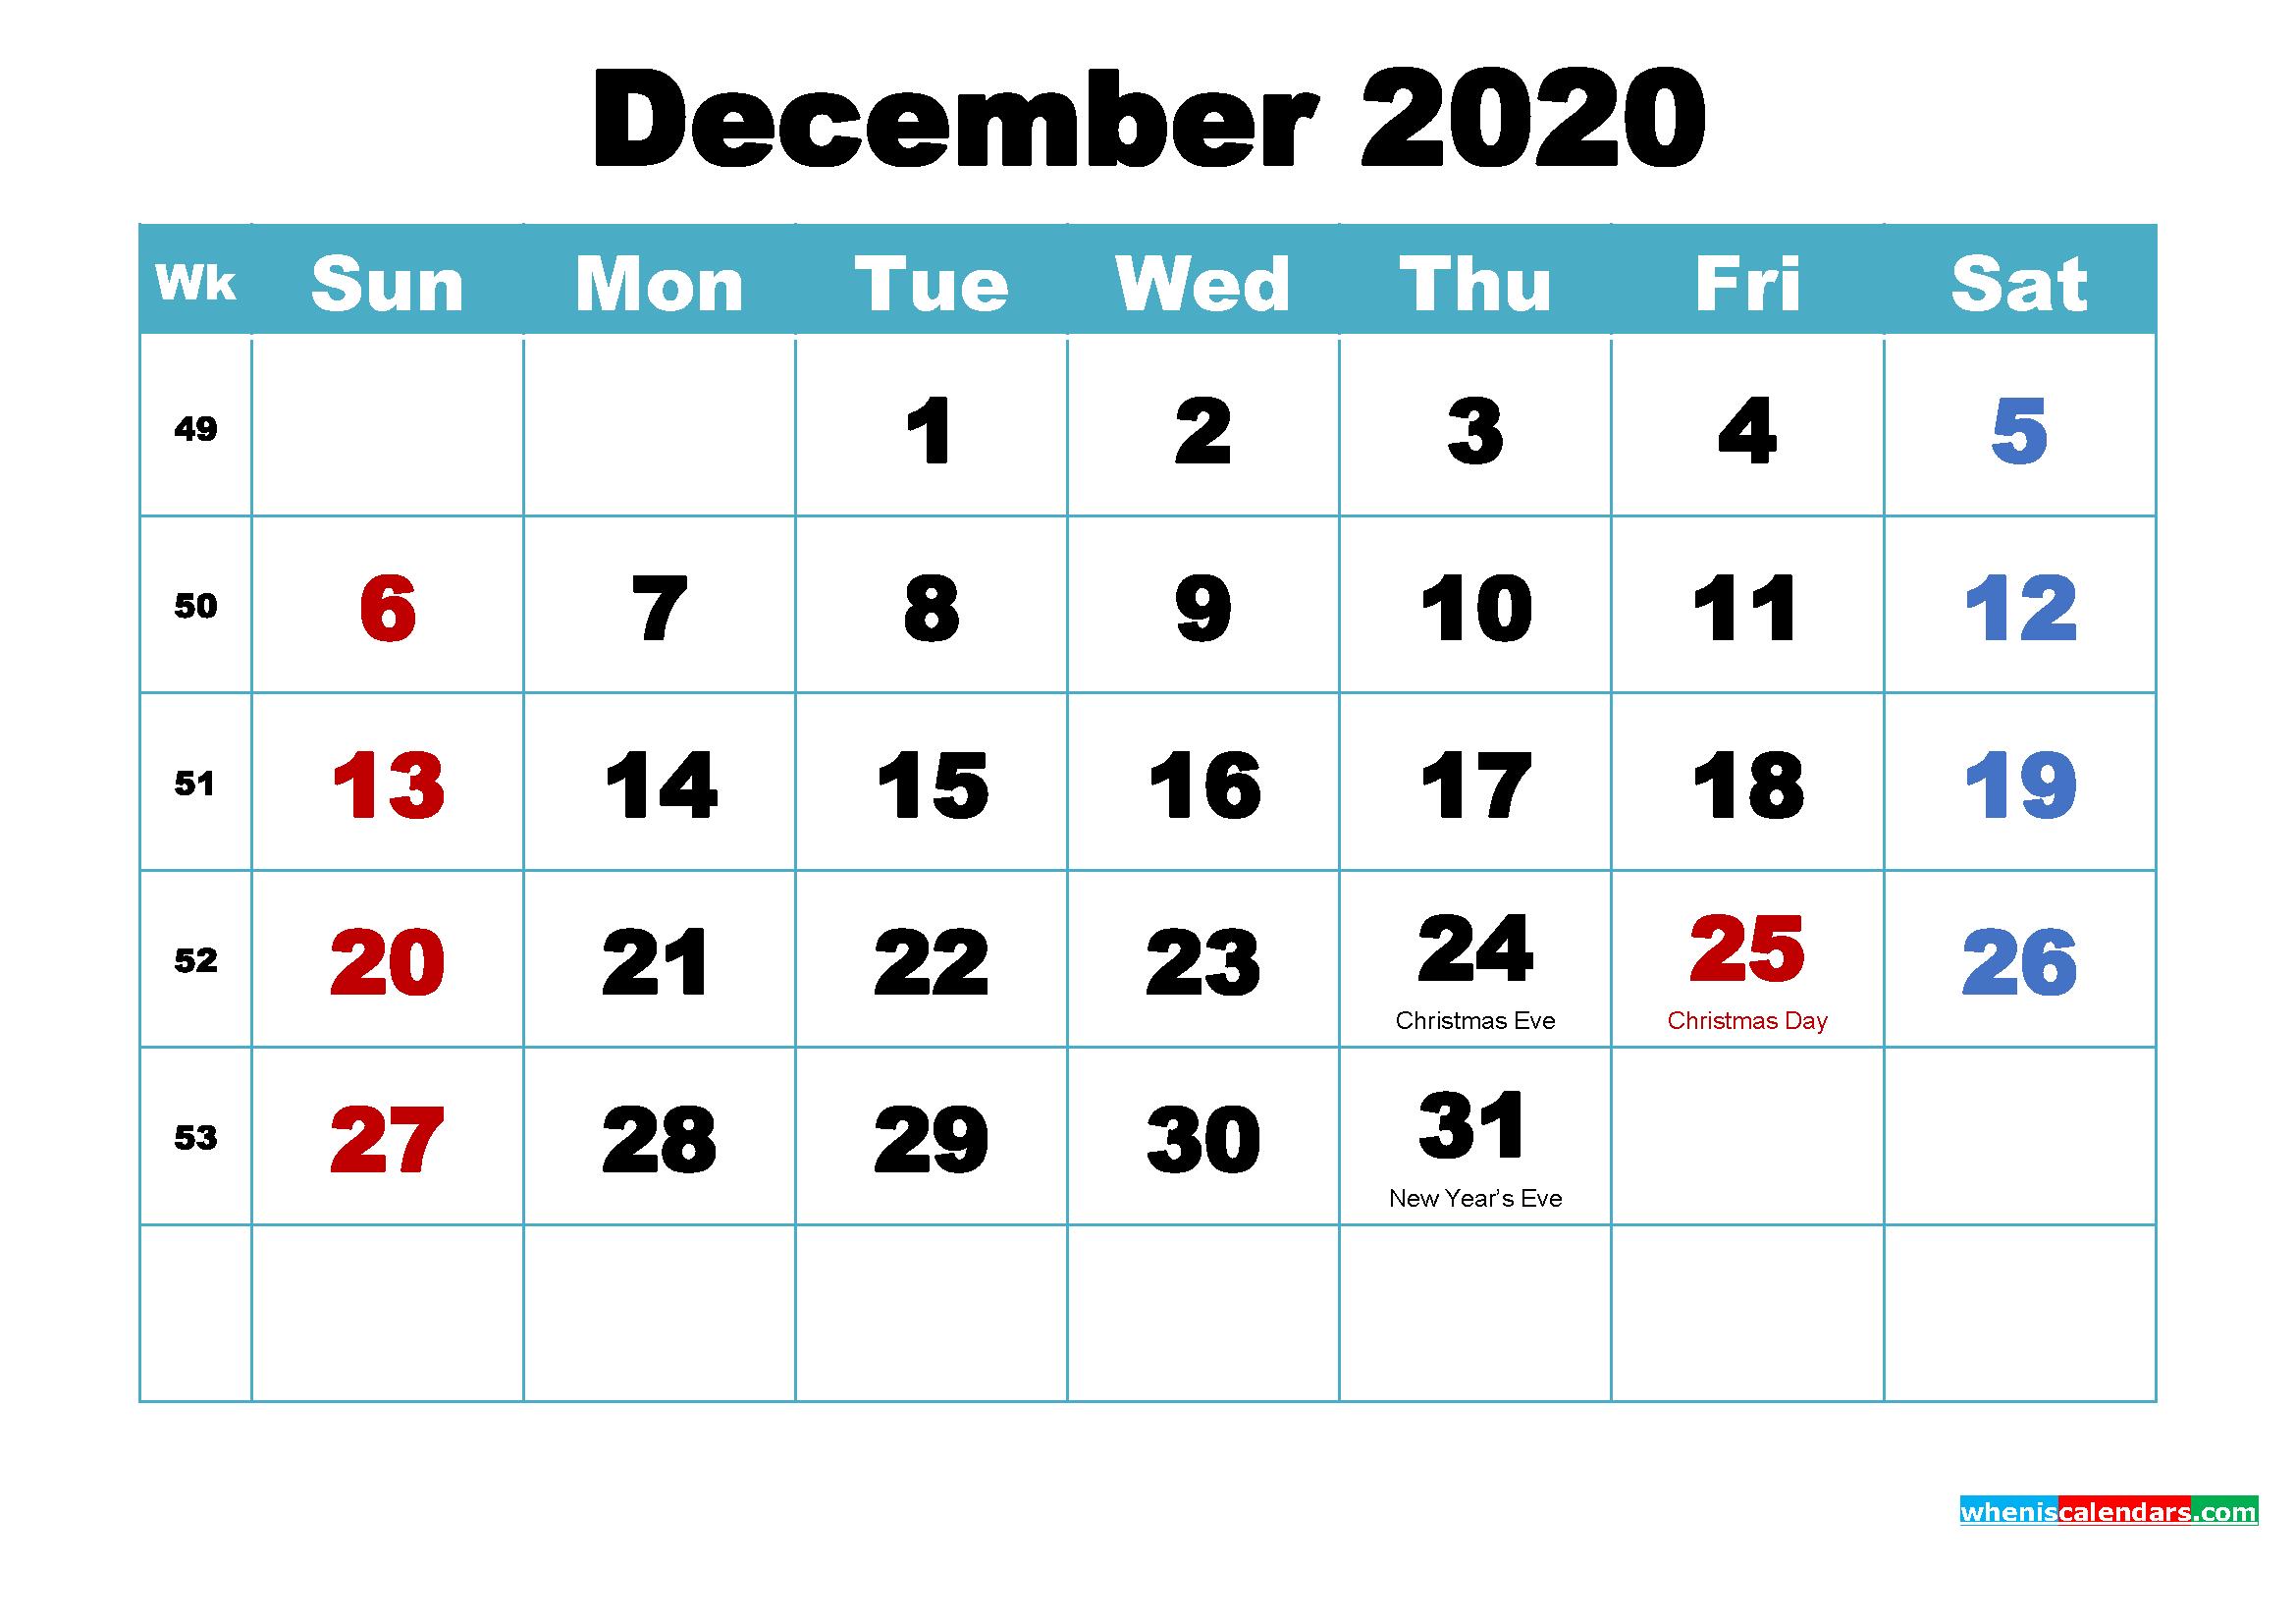 December 2020 Calendar Wallpaper Free Download